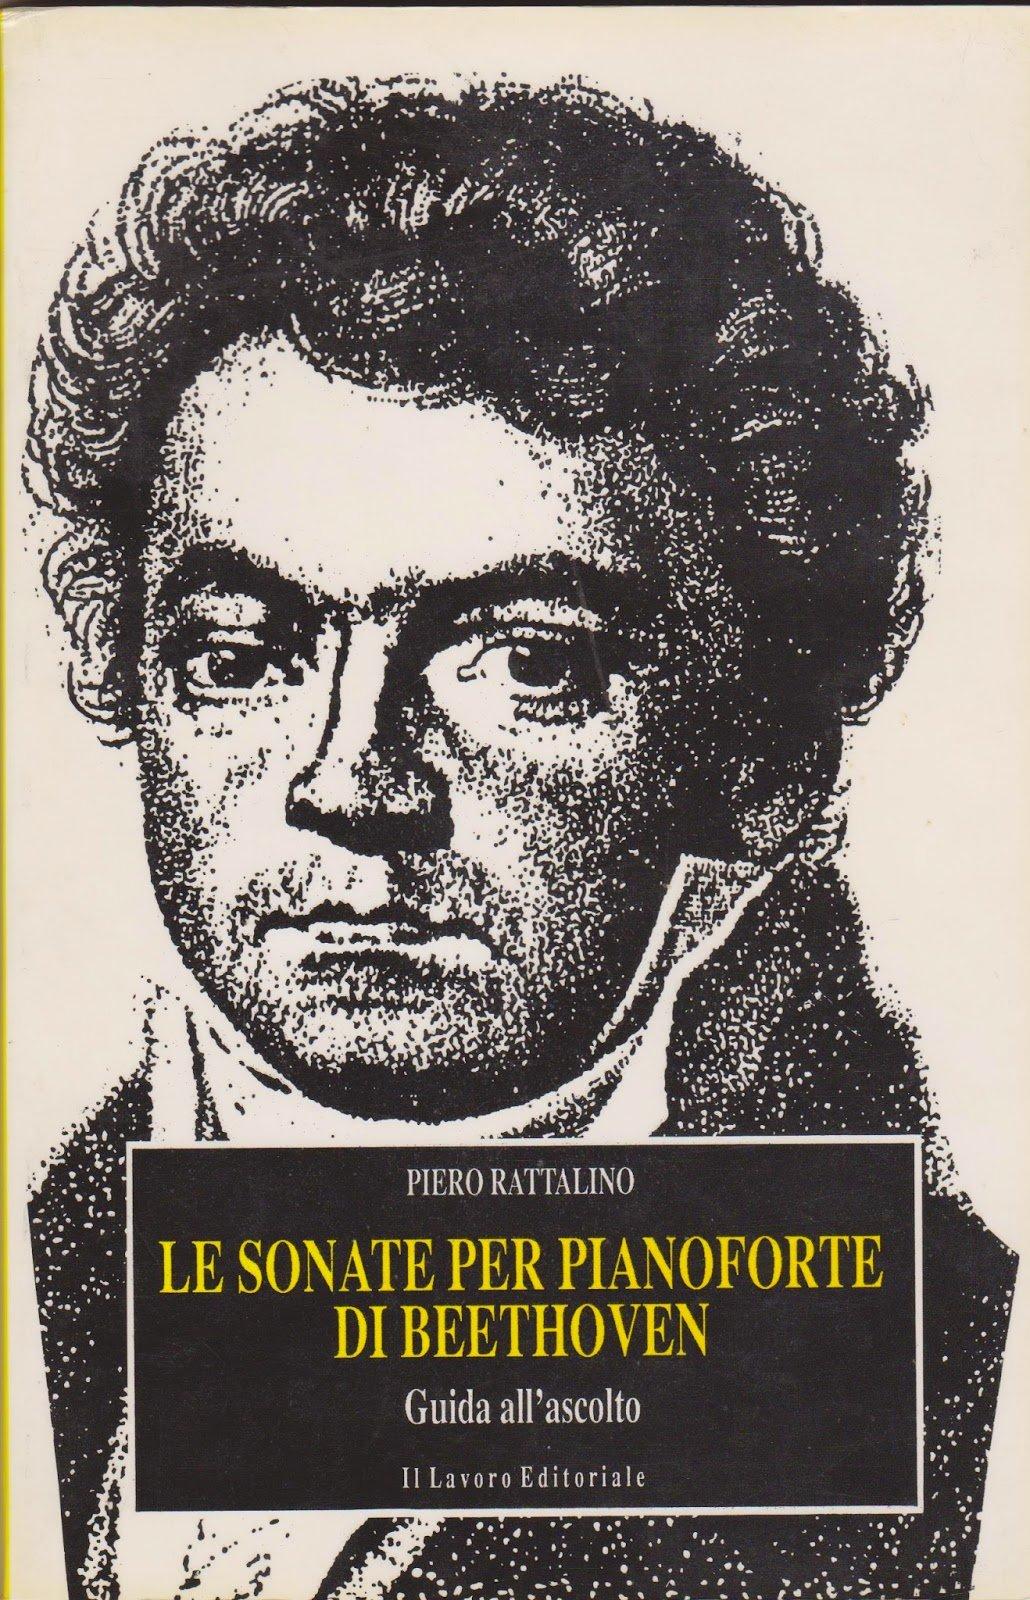 Rattalino Piero